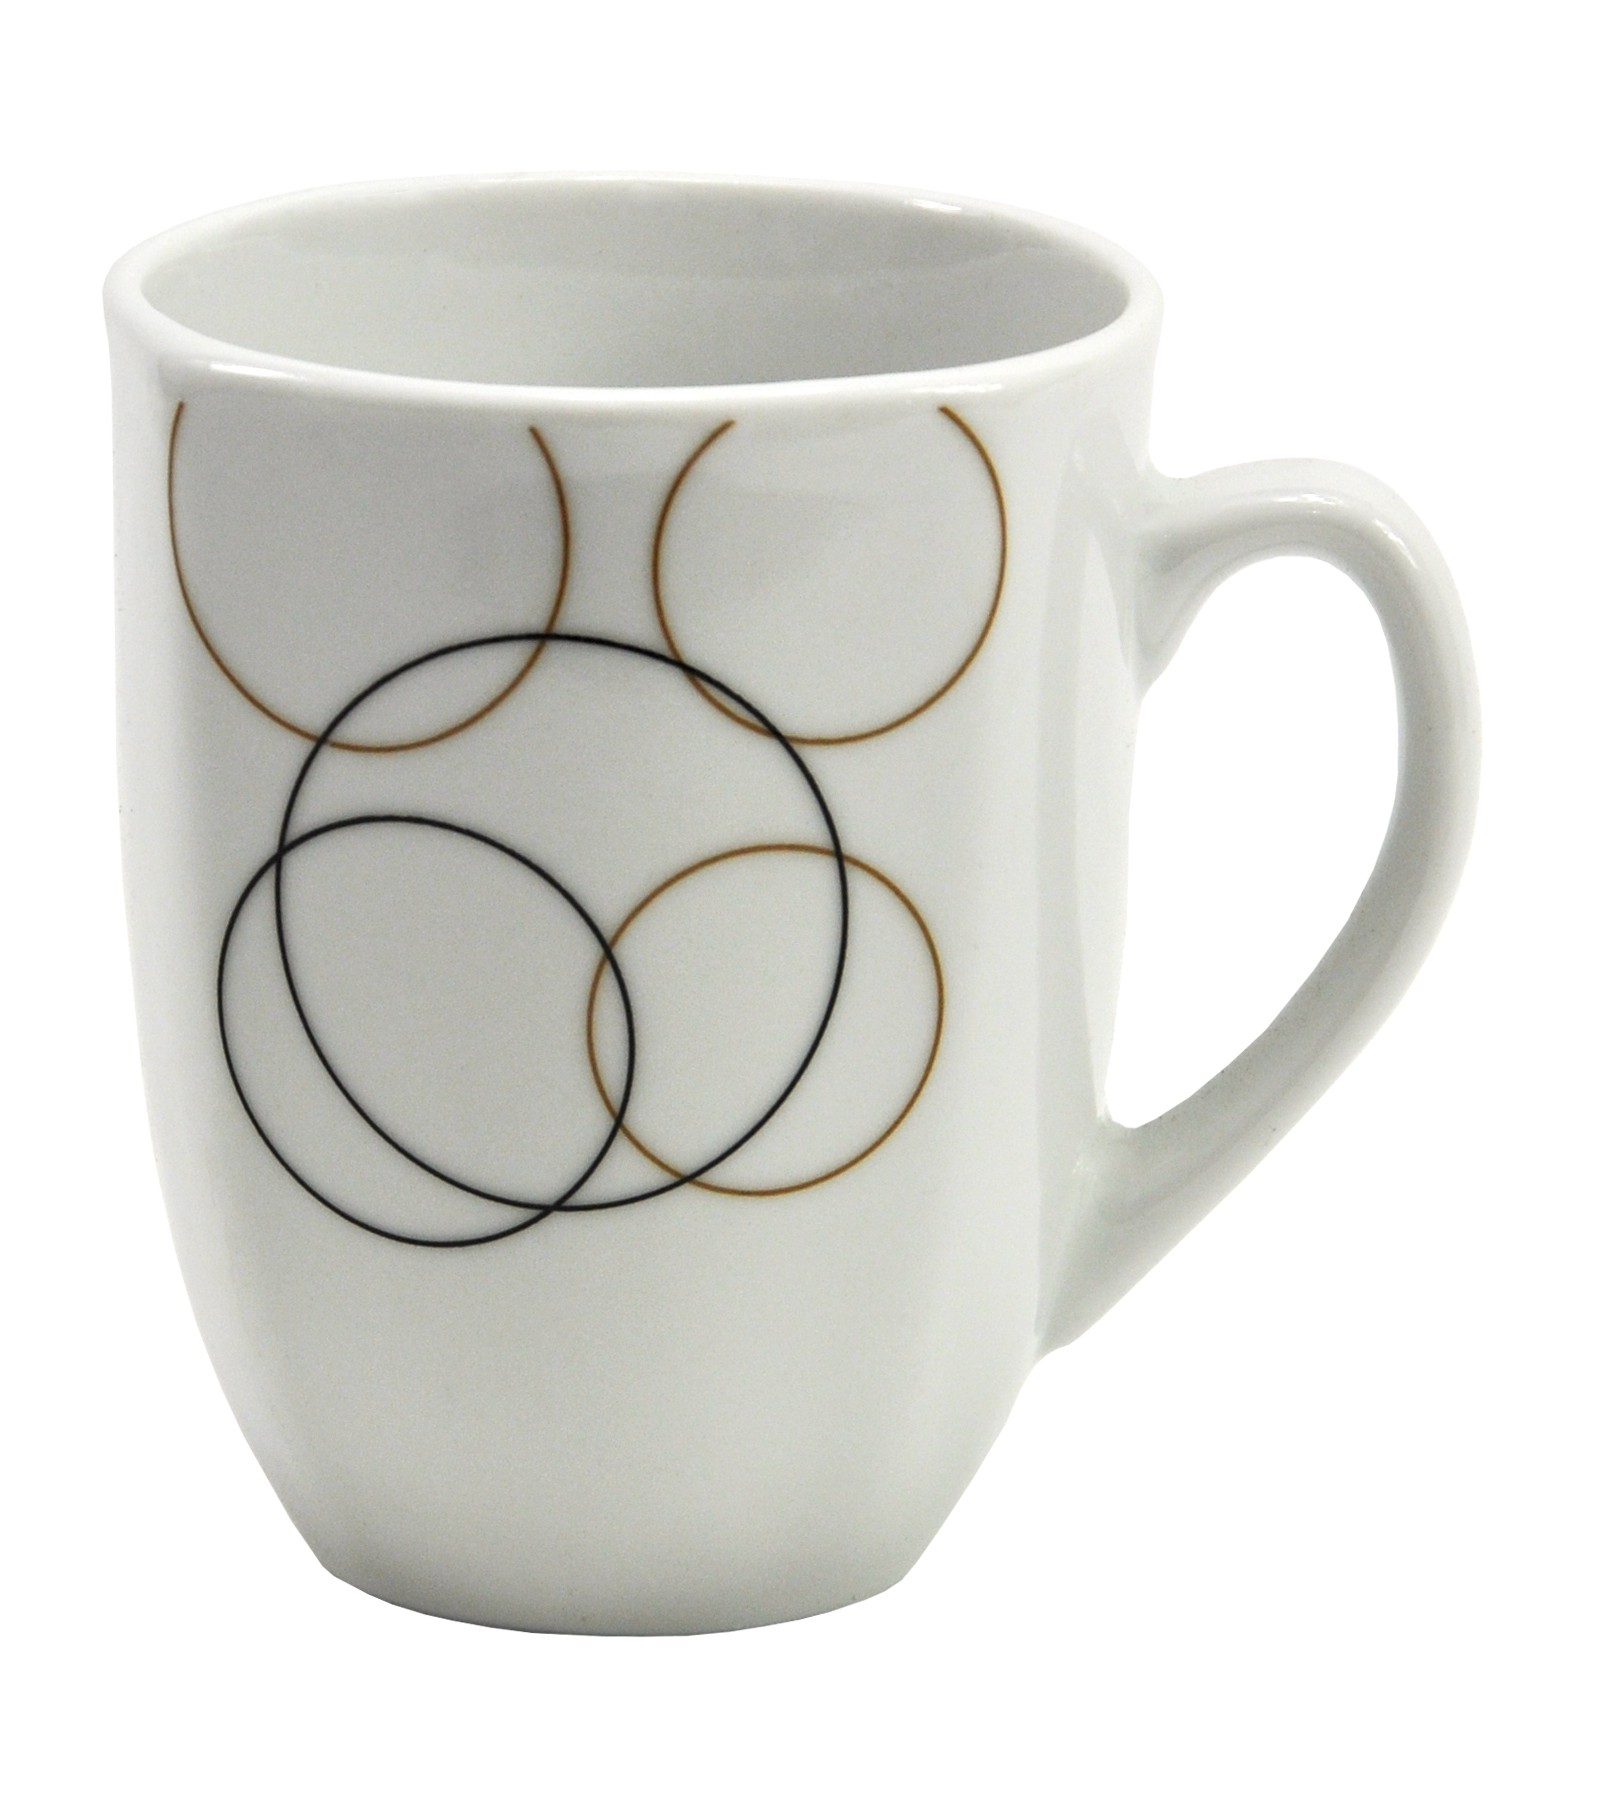 kaffeebecher look 33cl porzellan tassen und becher. Black Bedroom Furniture Sets. Home Design Ideas